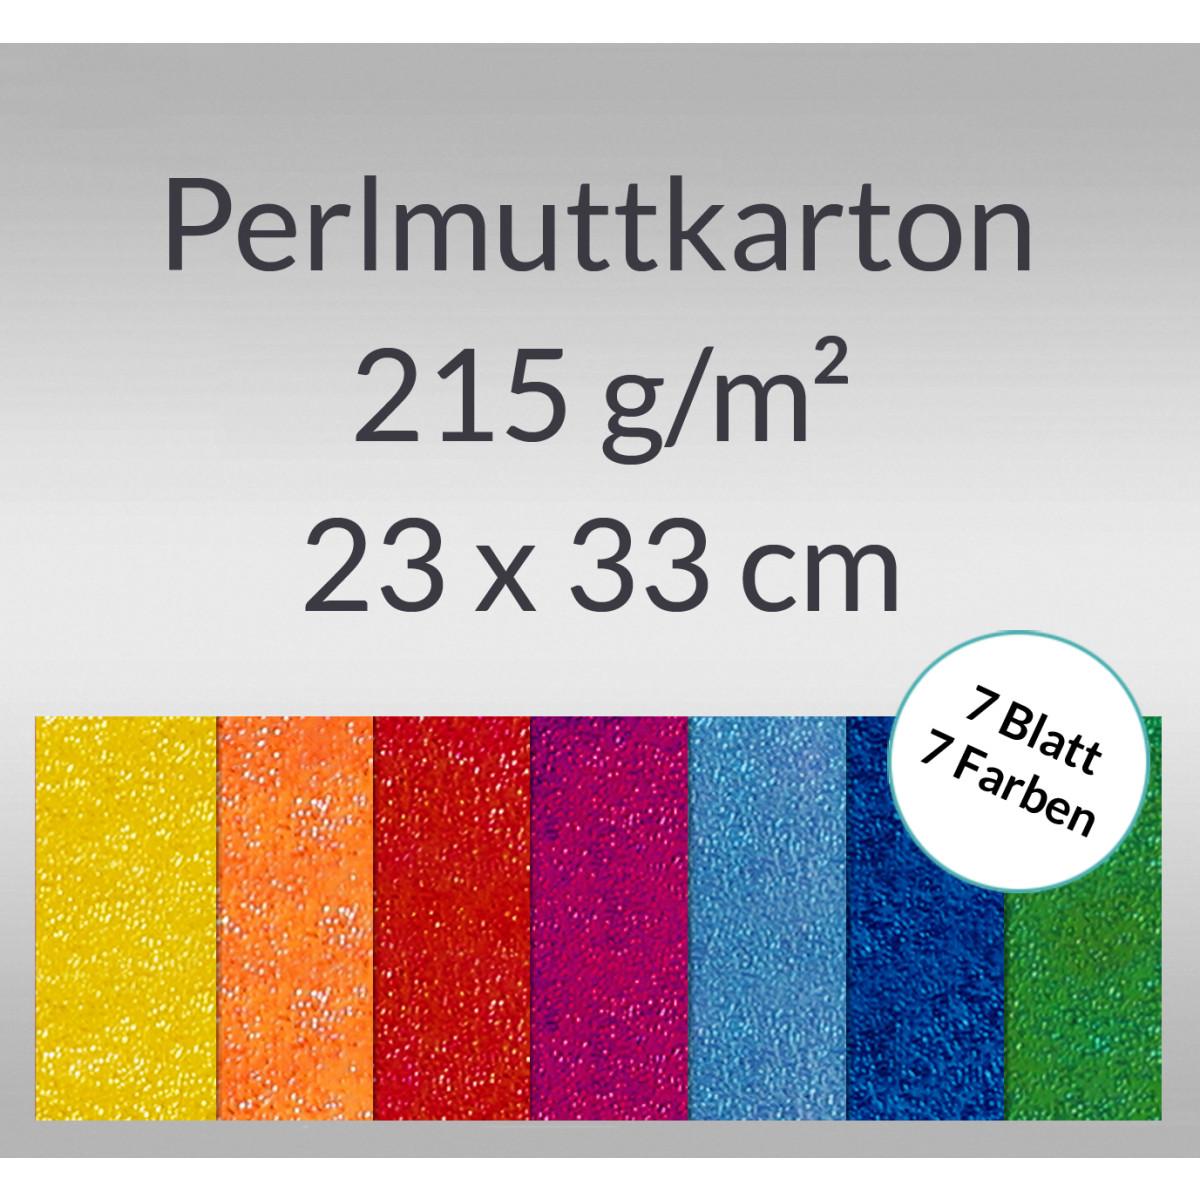 Pearlmuttkarton 23 x 33 cm - 7 Blatt sortiert